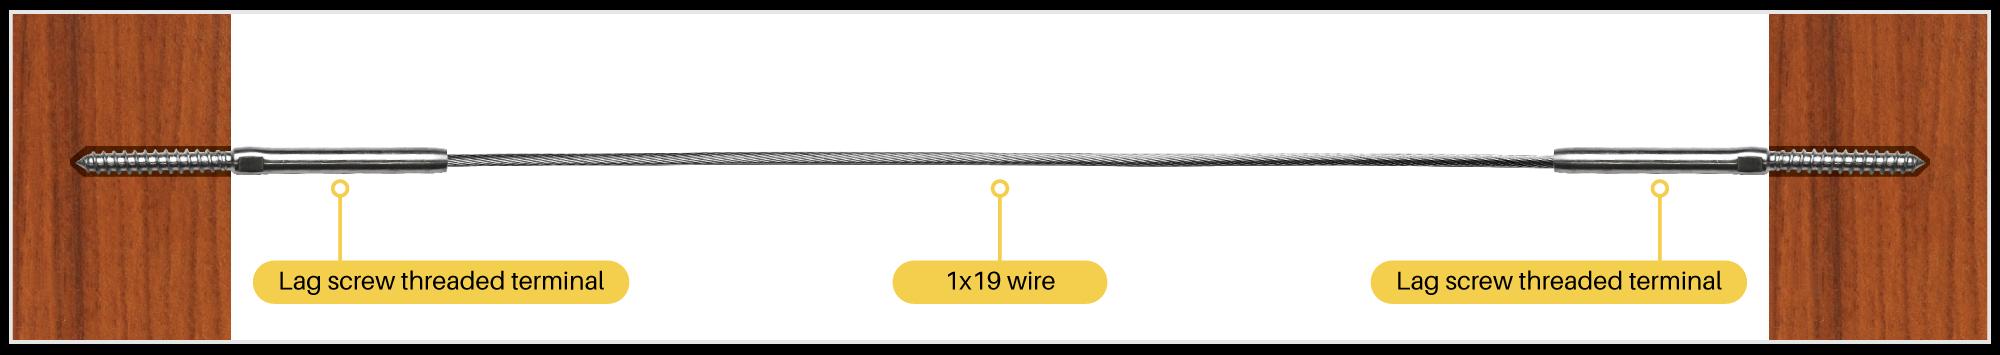 Lag-screw-threaded-terminal-terminal.png